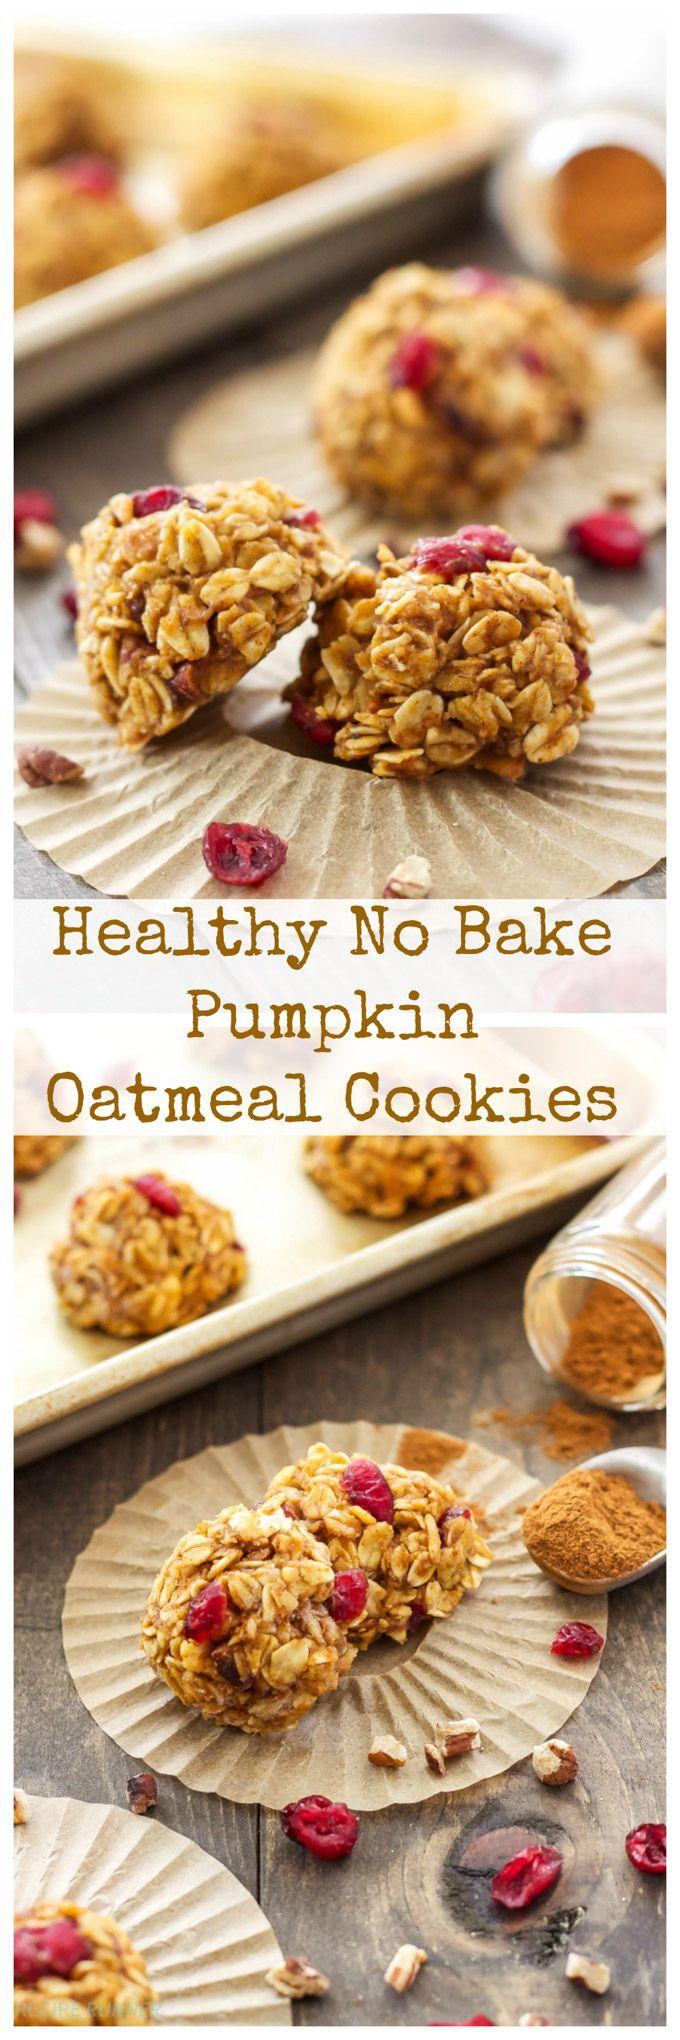 Healthy No Bake Pumpkin Oatmeal Cookies | These healthy pumpkin cookies are the perfect no bake fall treat!